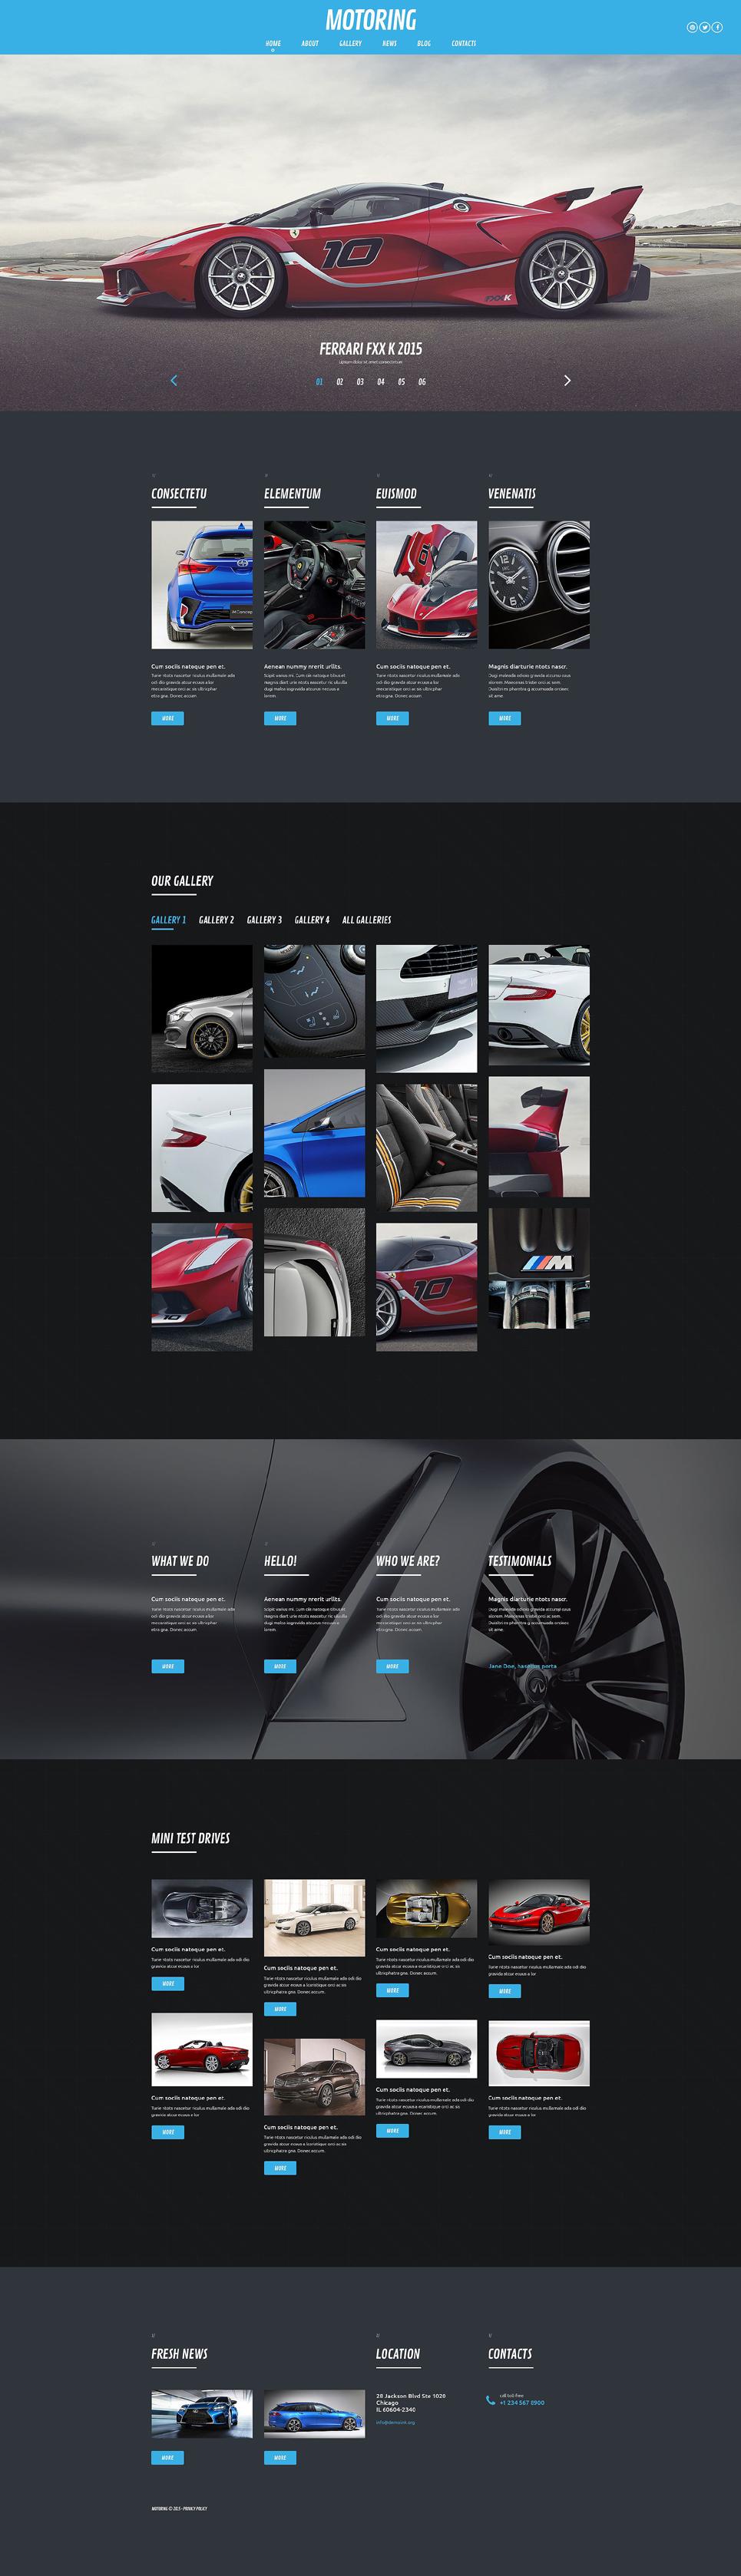 Адаптивный шаблон сайта на тему автомобиль #53882